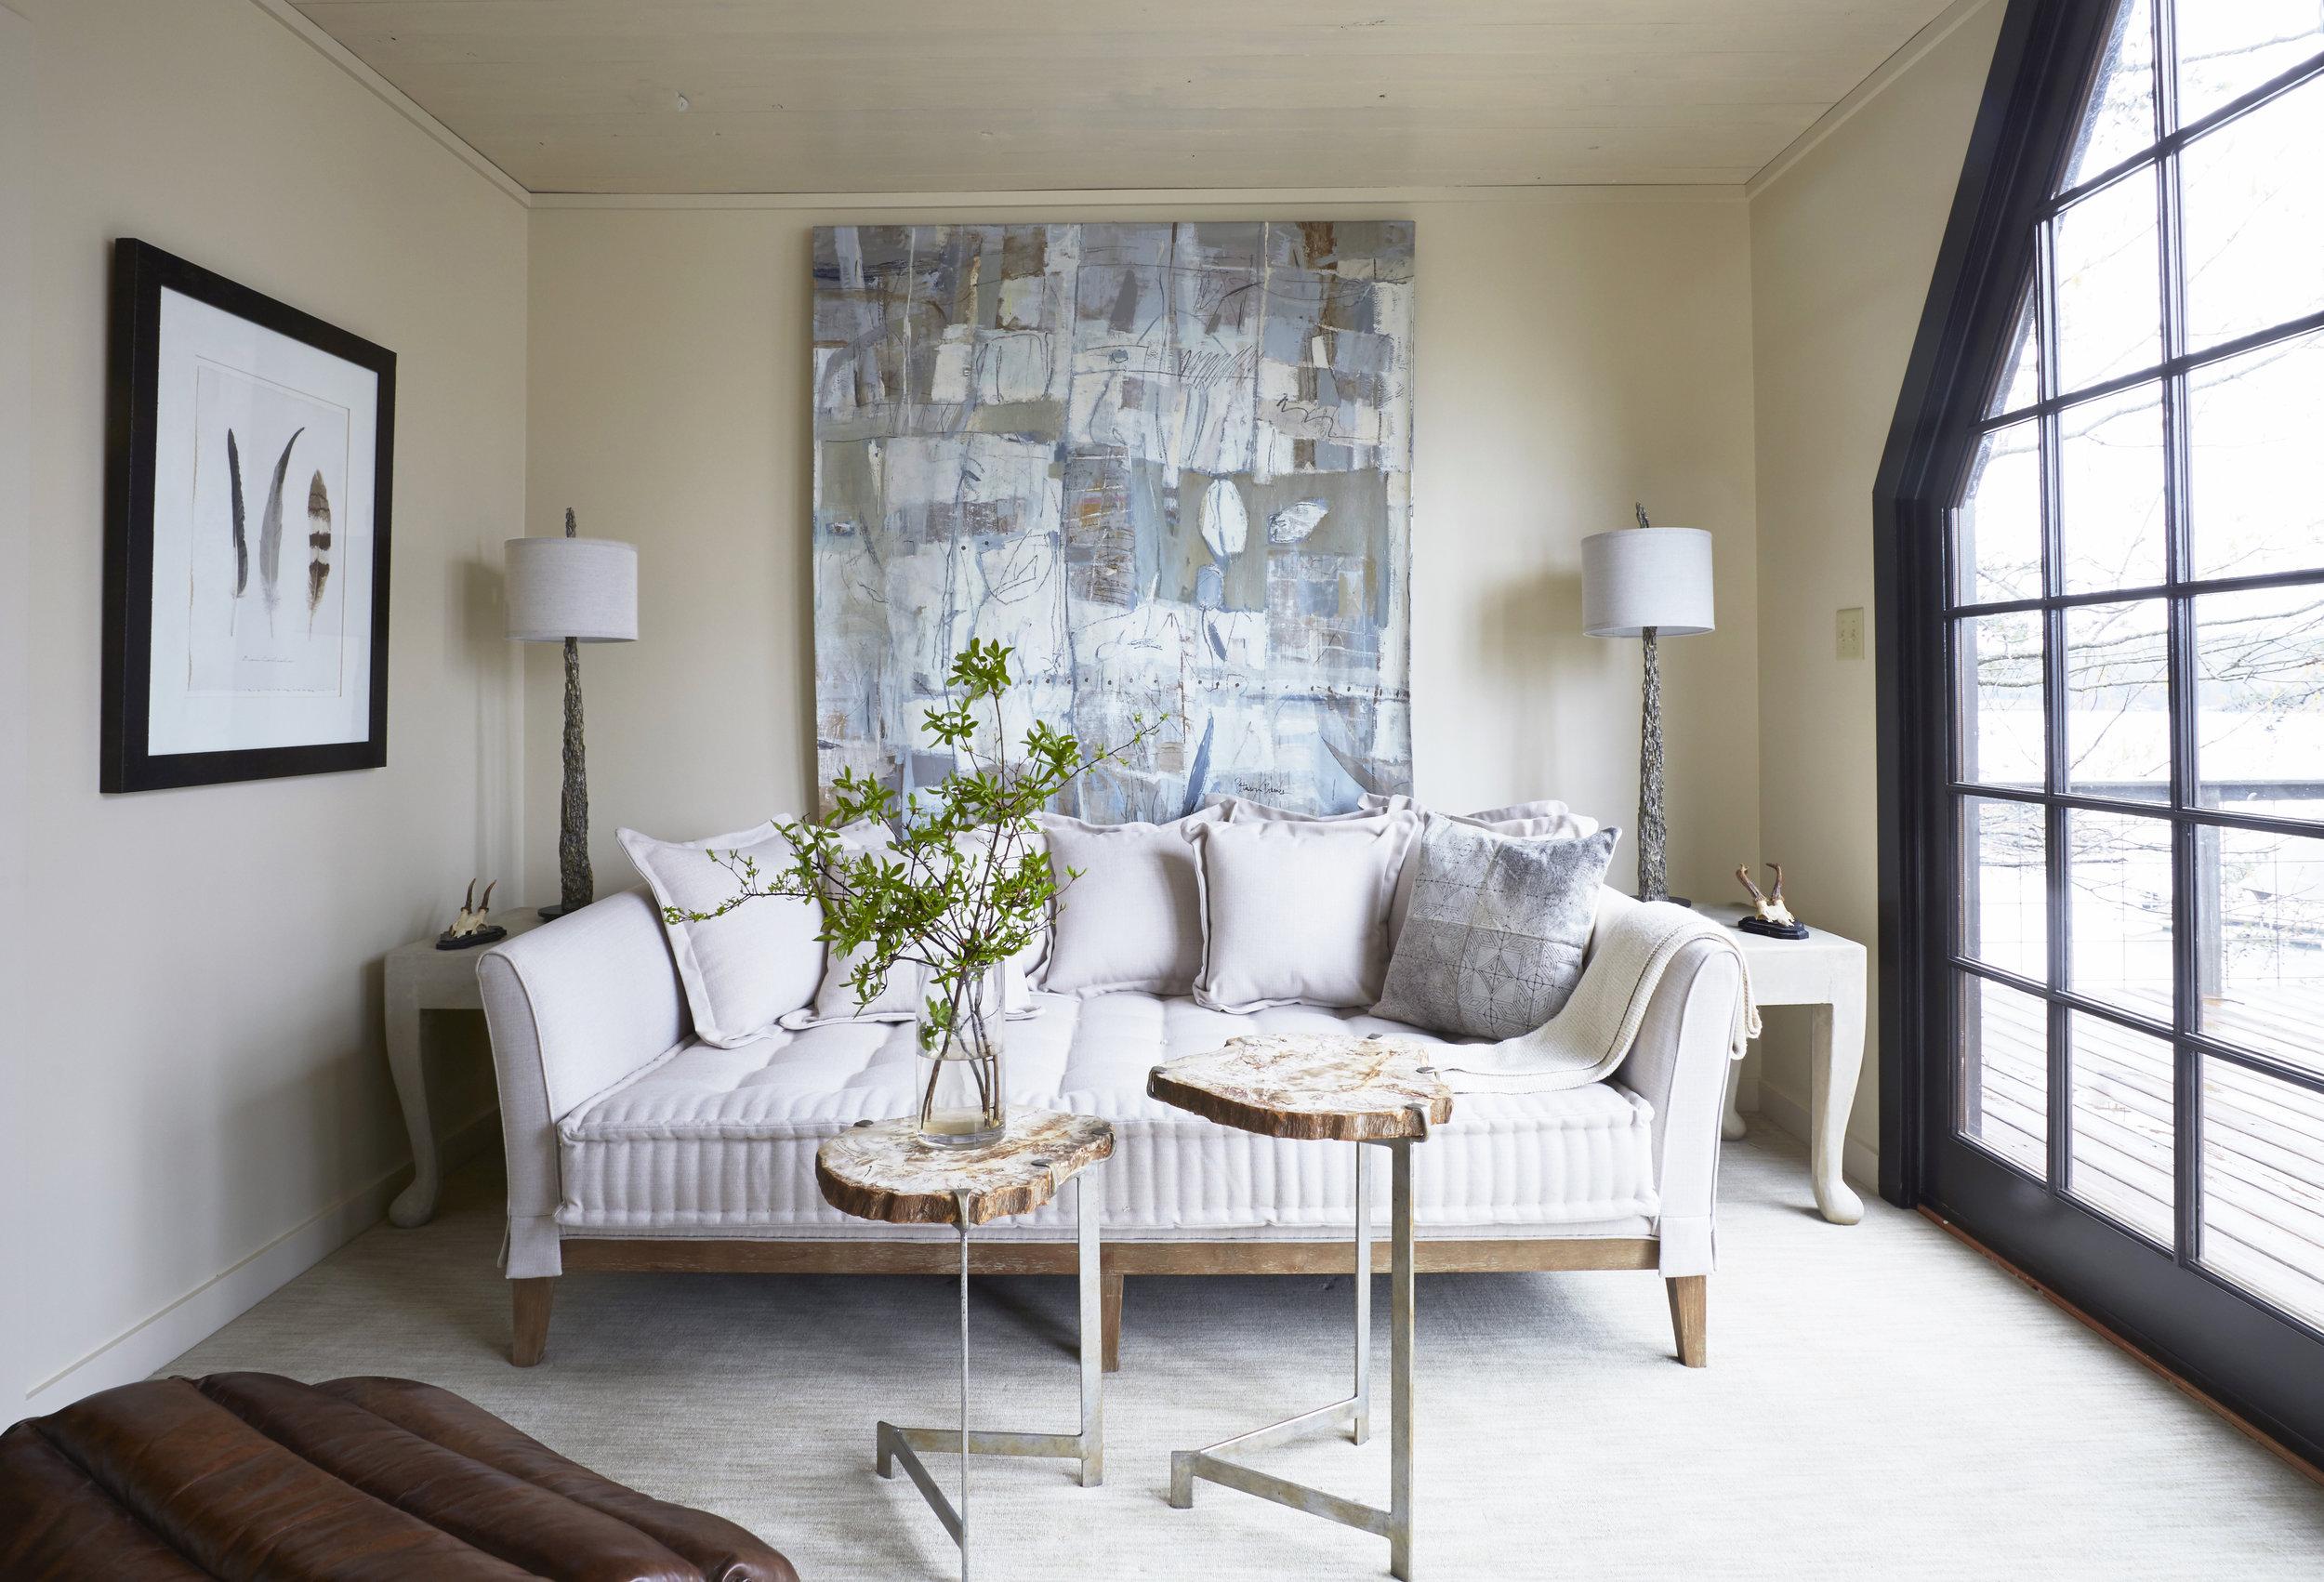 Seven Sticks Lake House magazine feature interior and exterior architecture design 2016 Alabama